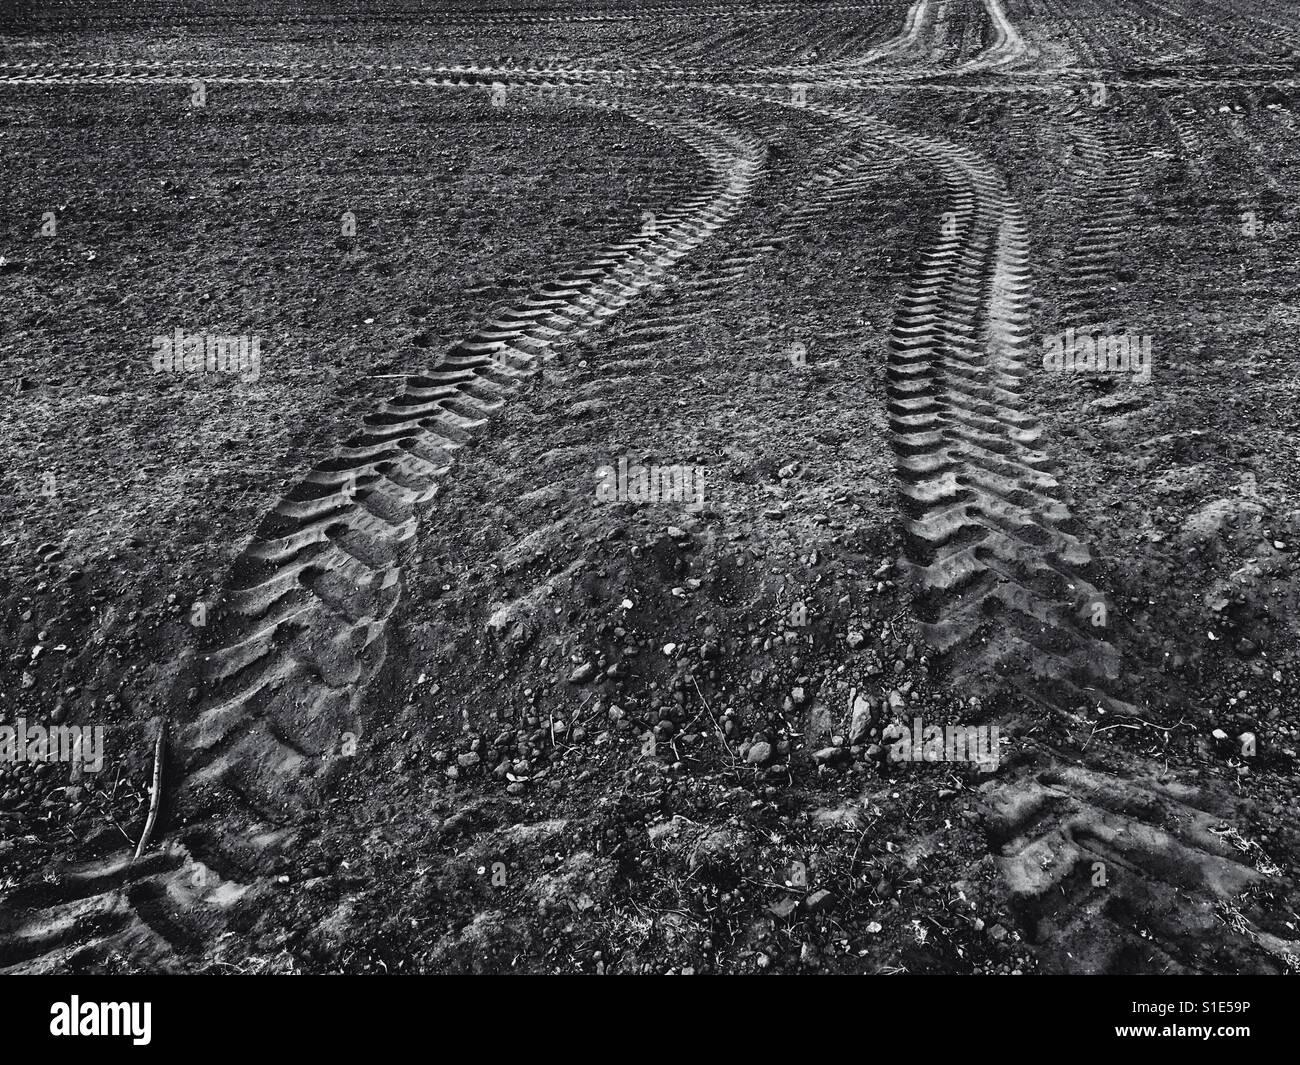 Tyre tracks - Stock Image